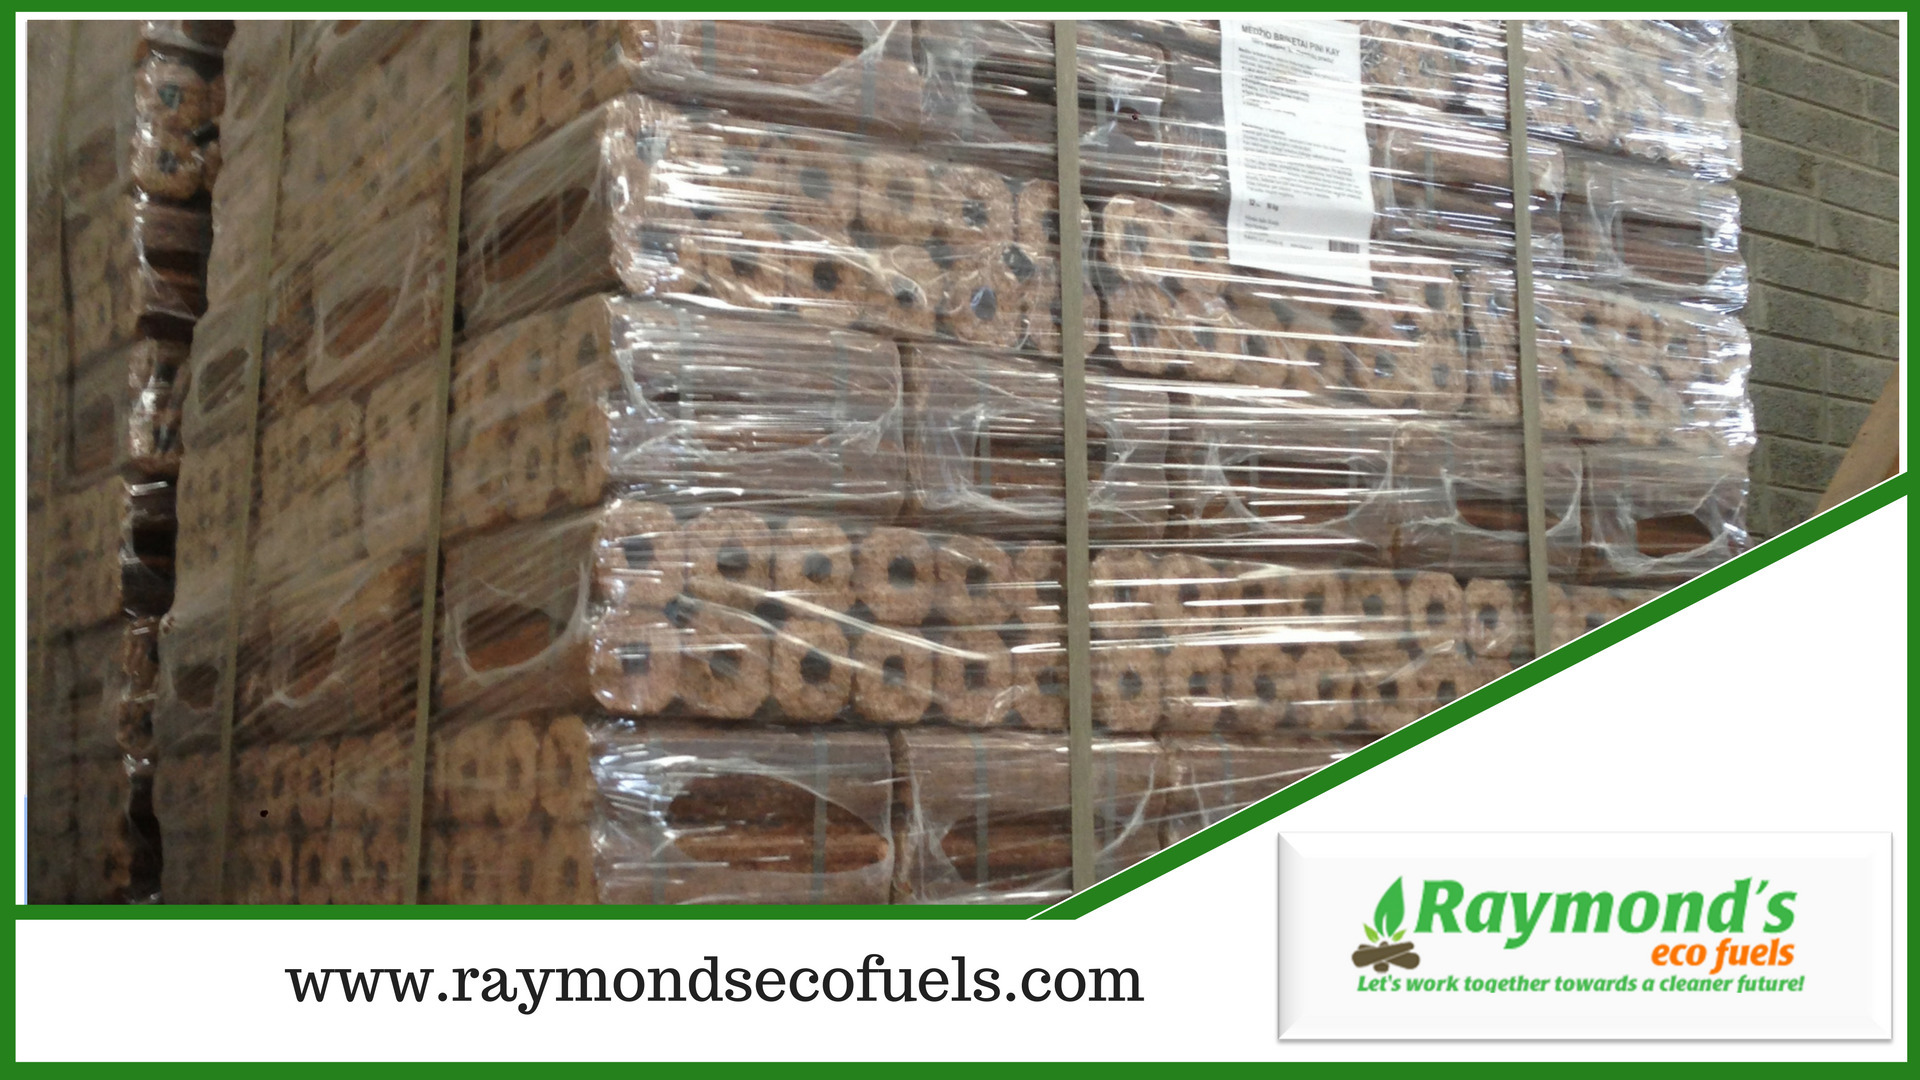 Raymonds Eco Fuels Kiln Dried Firewood (@kiln-dried-firewood) Cover Image